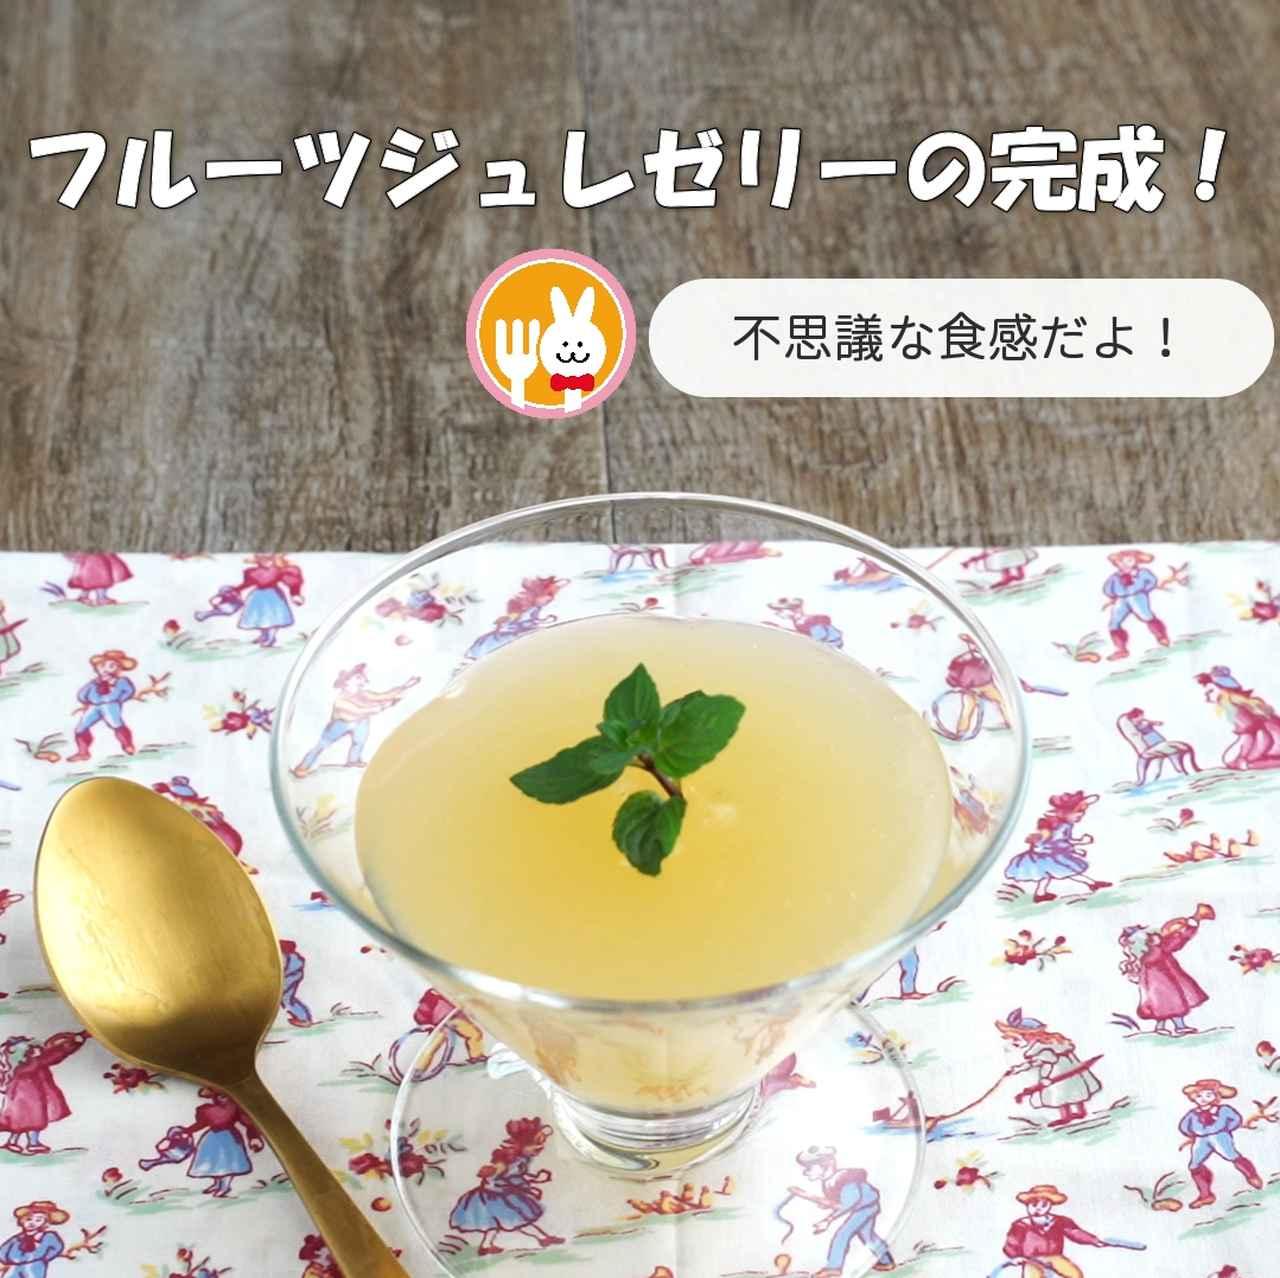 画像4: 管理栄養士 内藤麻里子コメント